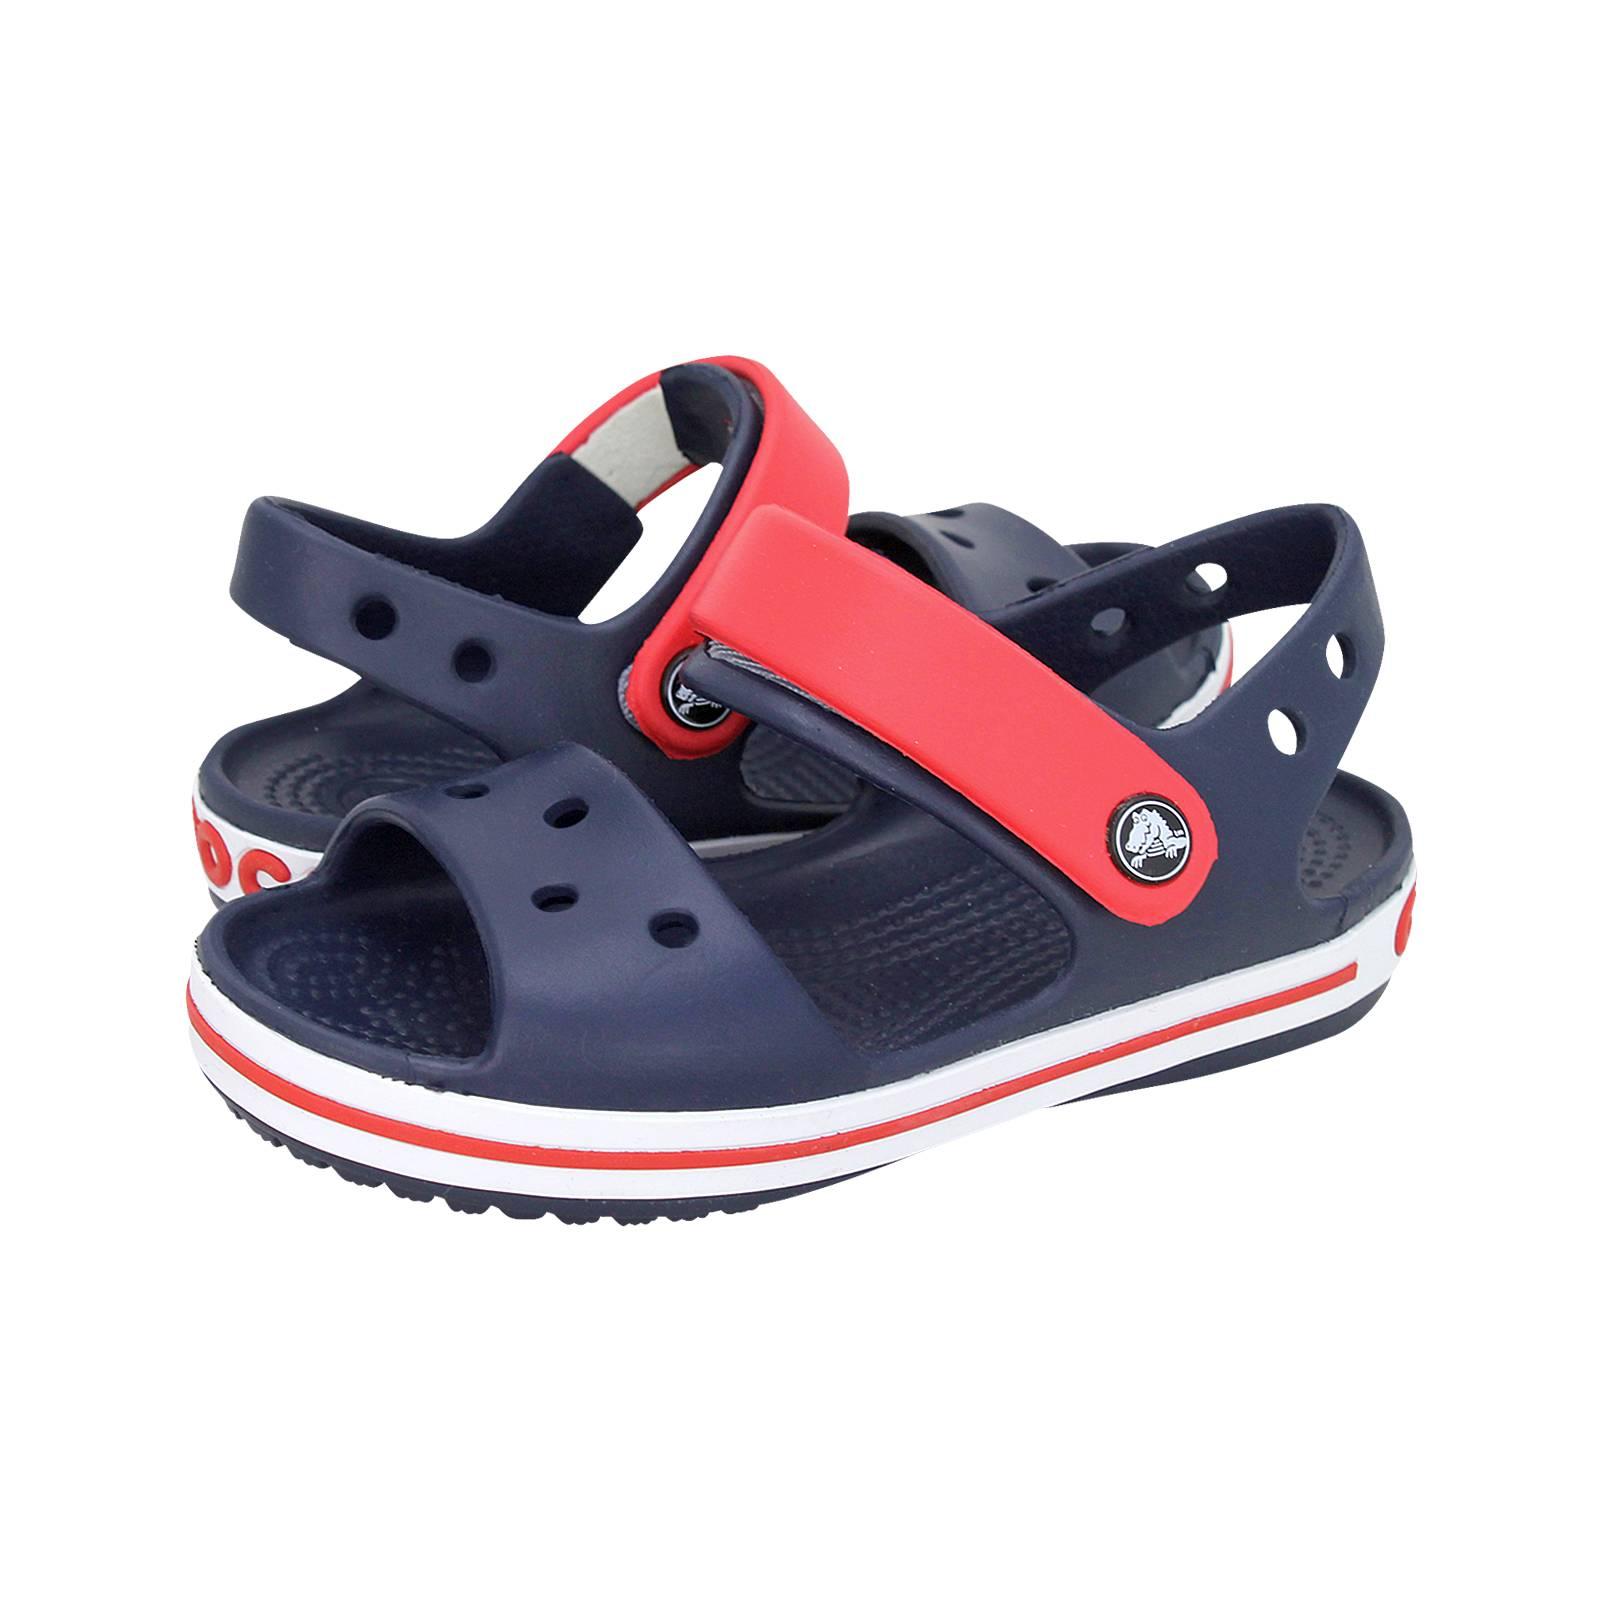 778c3687287c0 Crocband Sandal S - Crocs Kids  sandals made of croslite - Gianna ...